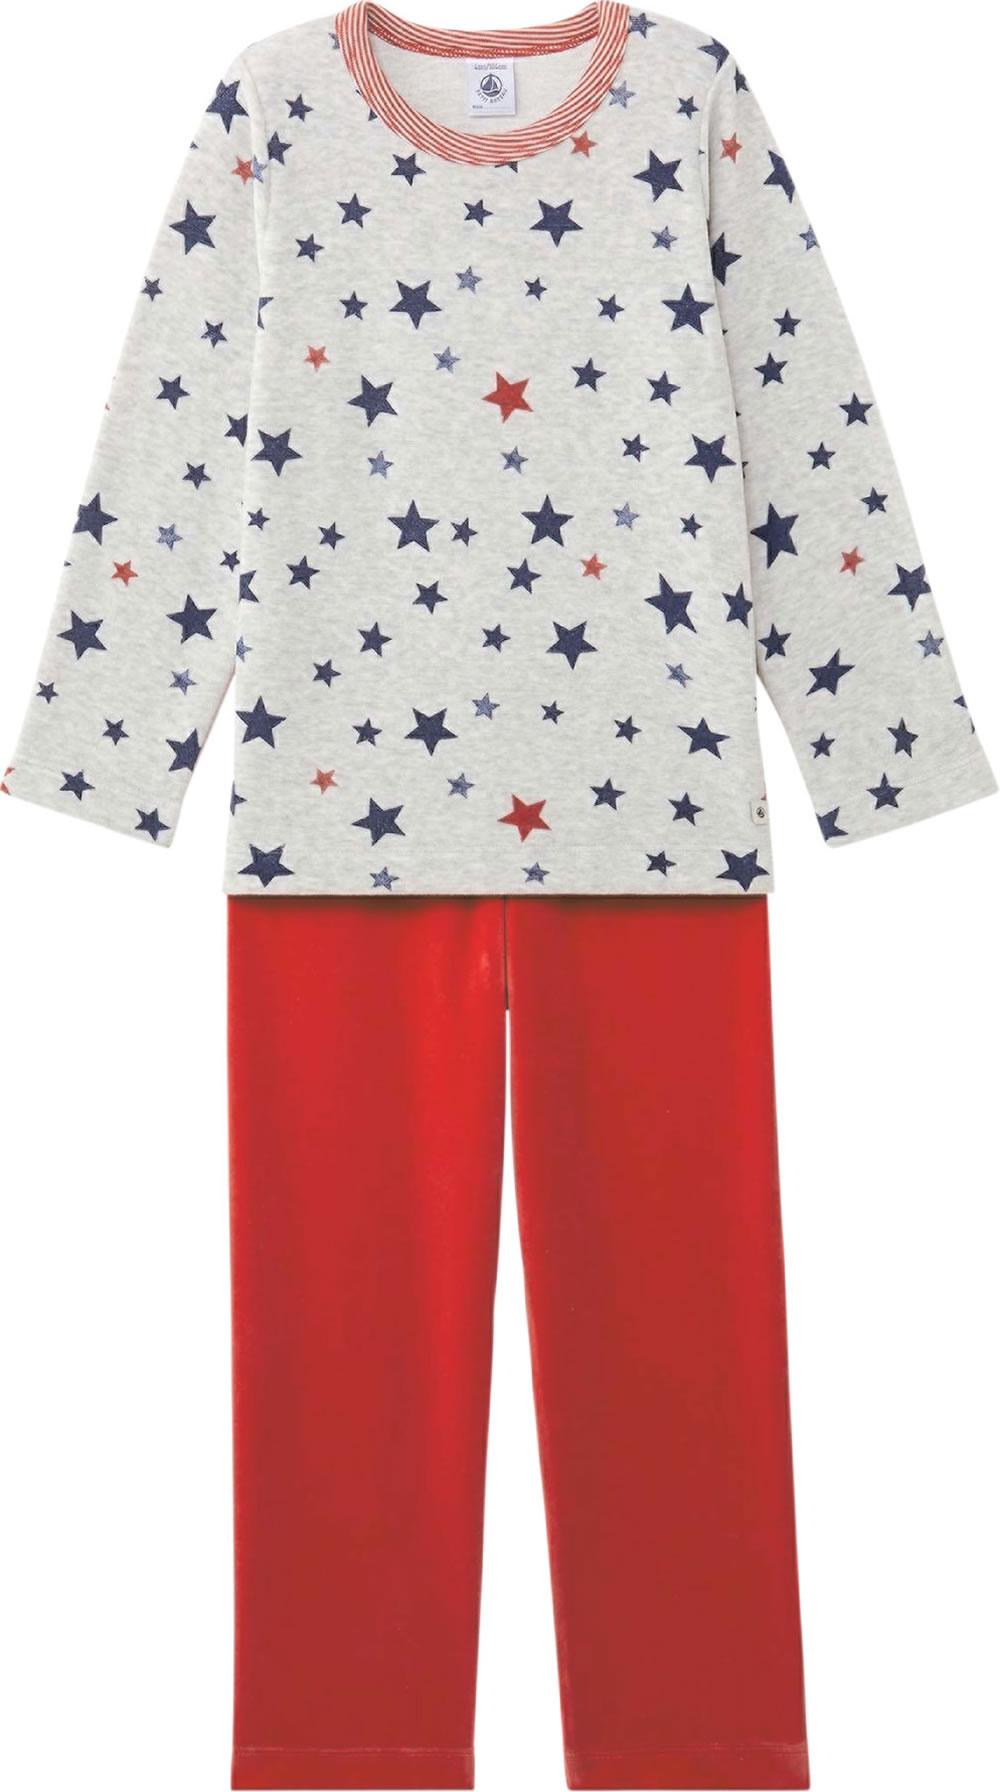 detailed look ac527 22d98 Petit Bateau Schlafanzug/Pyjama 2-teilig STERNE froufrou rot/grau 25454-67